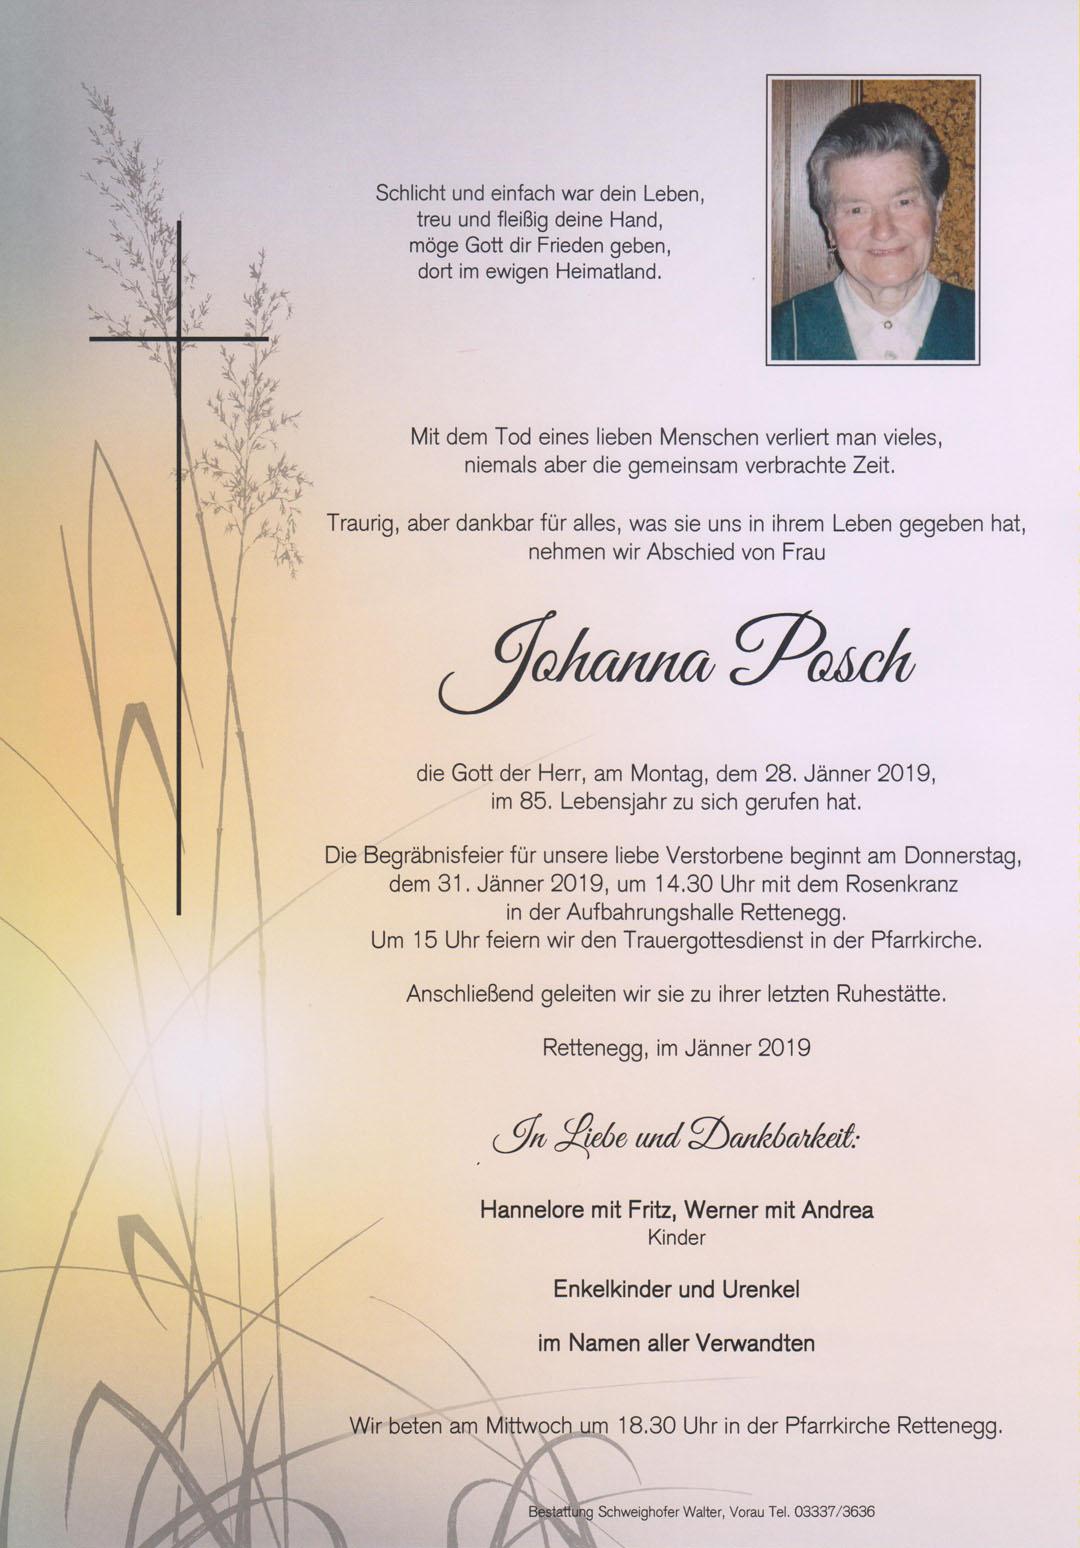 Johanna Posch